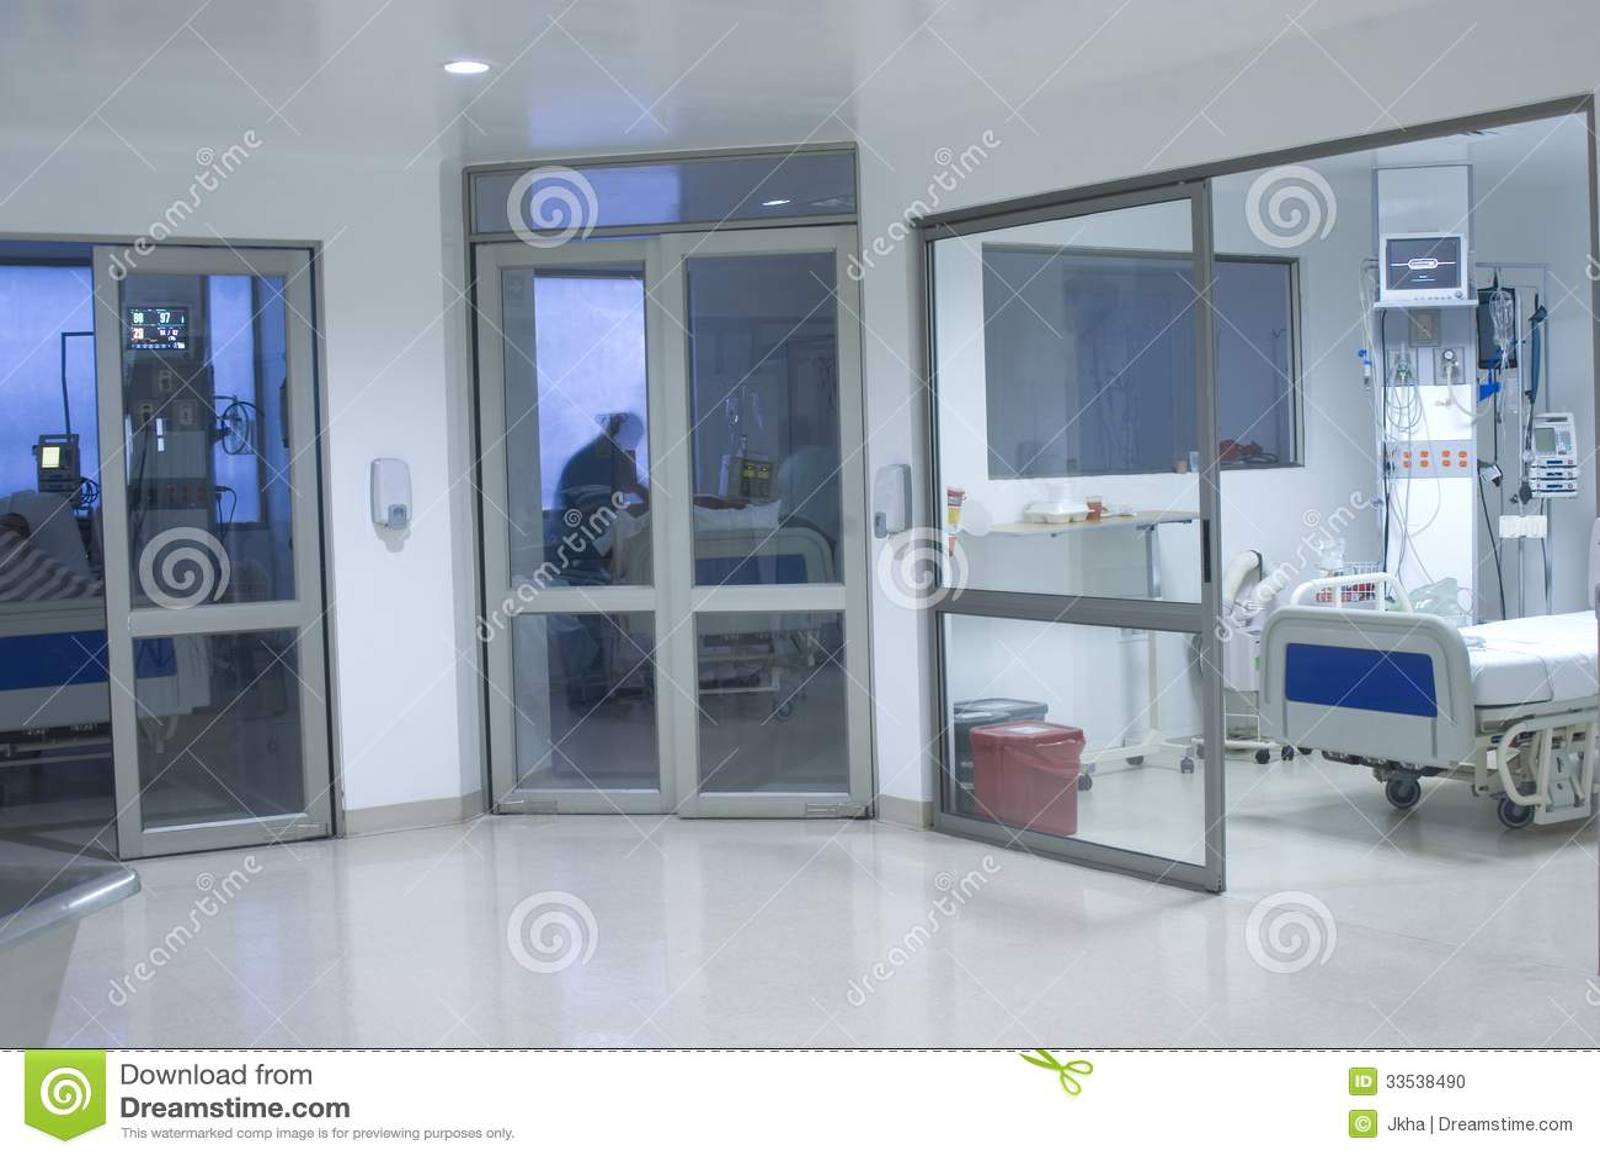 intrieur de couloir lintrieur dun hpital moderne photo stock - Hapital Moderne